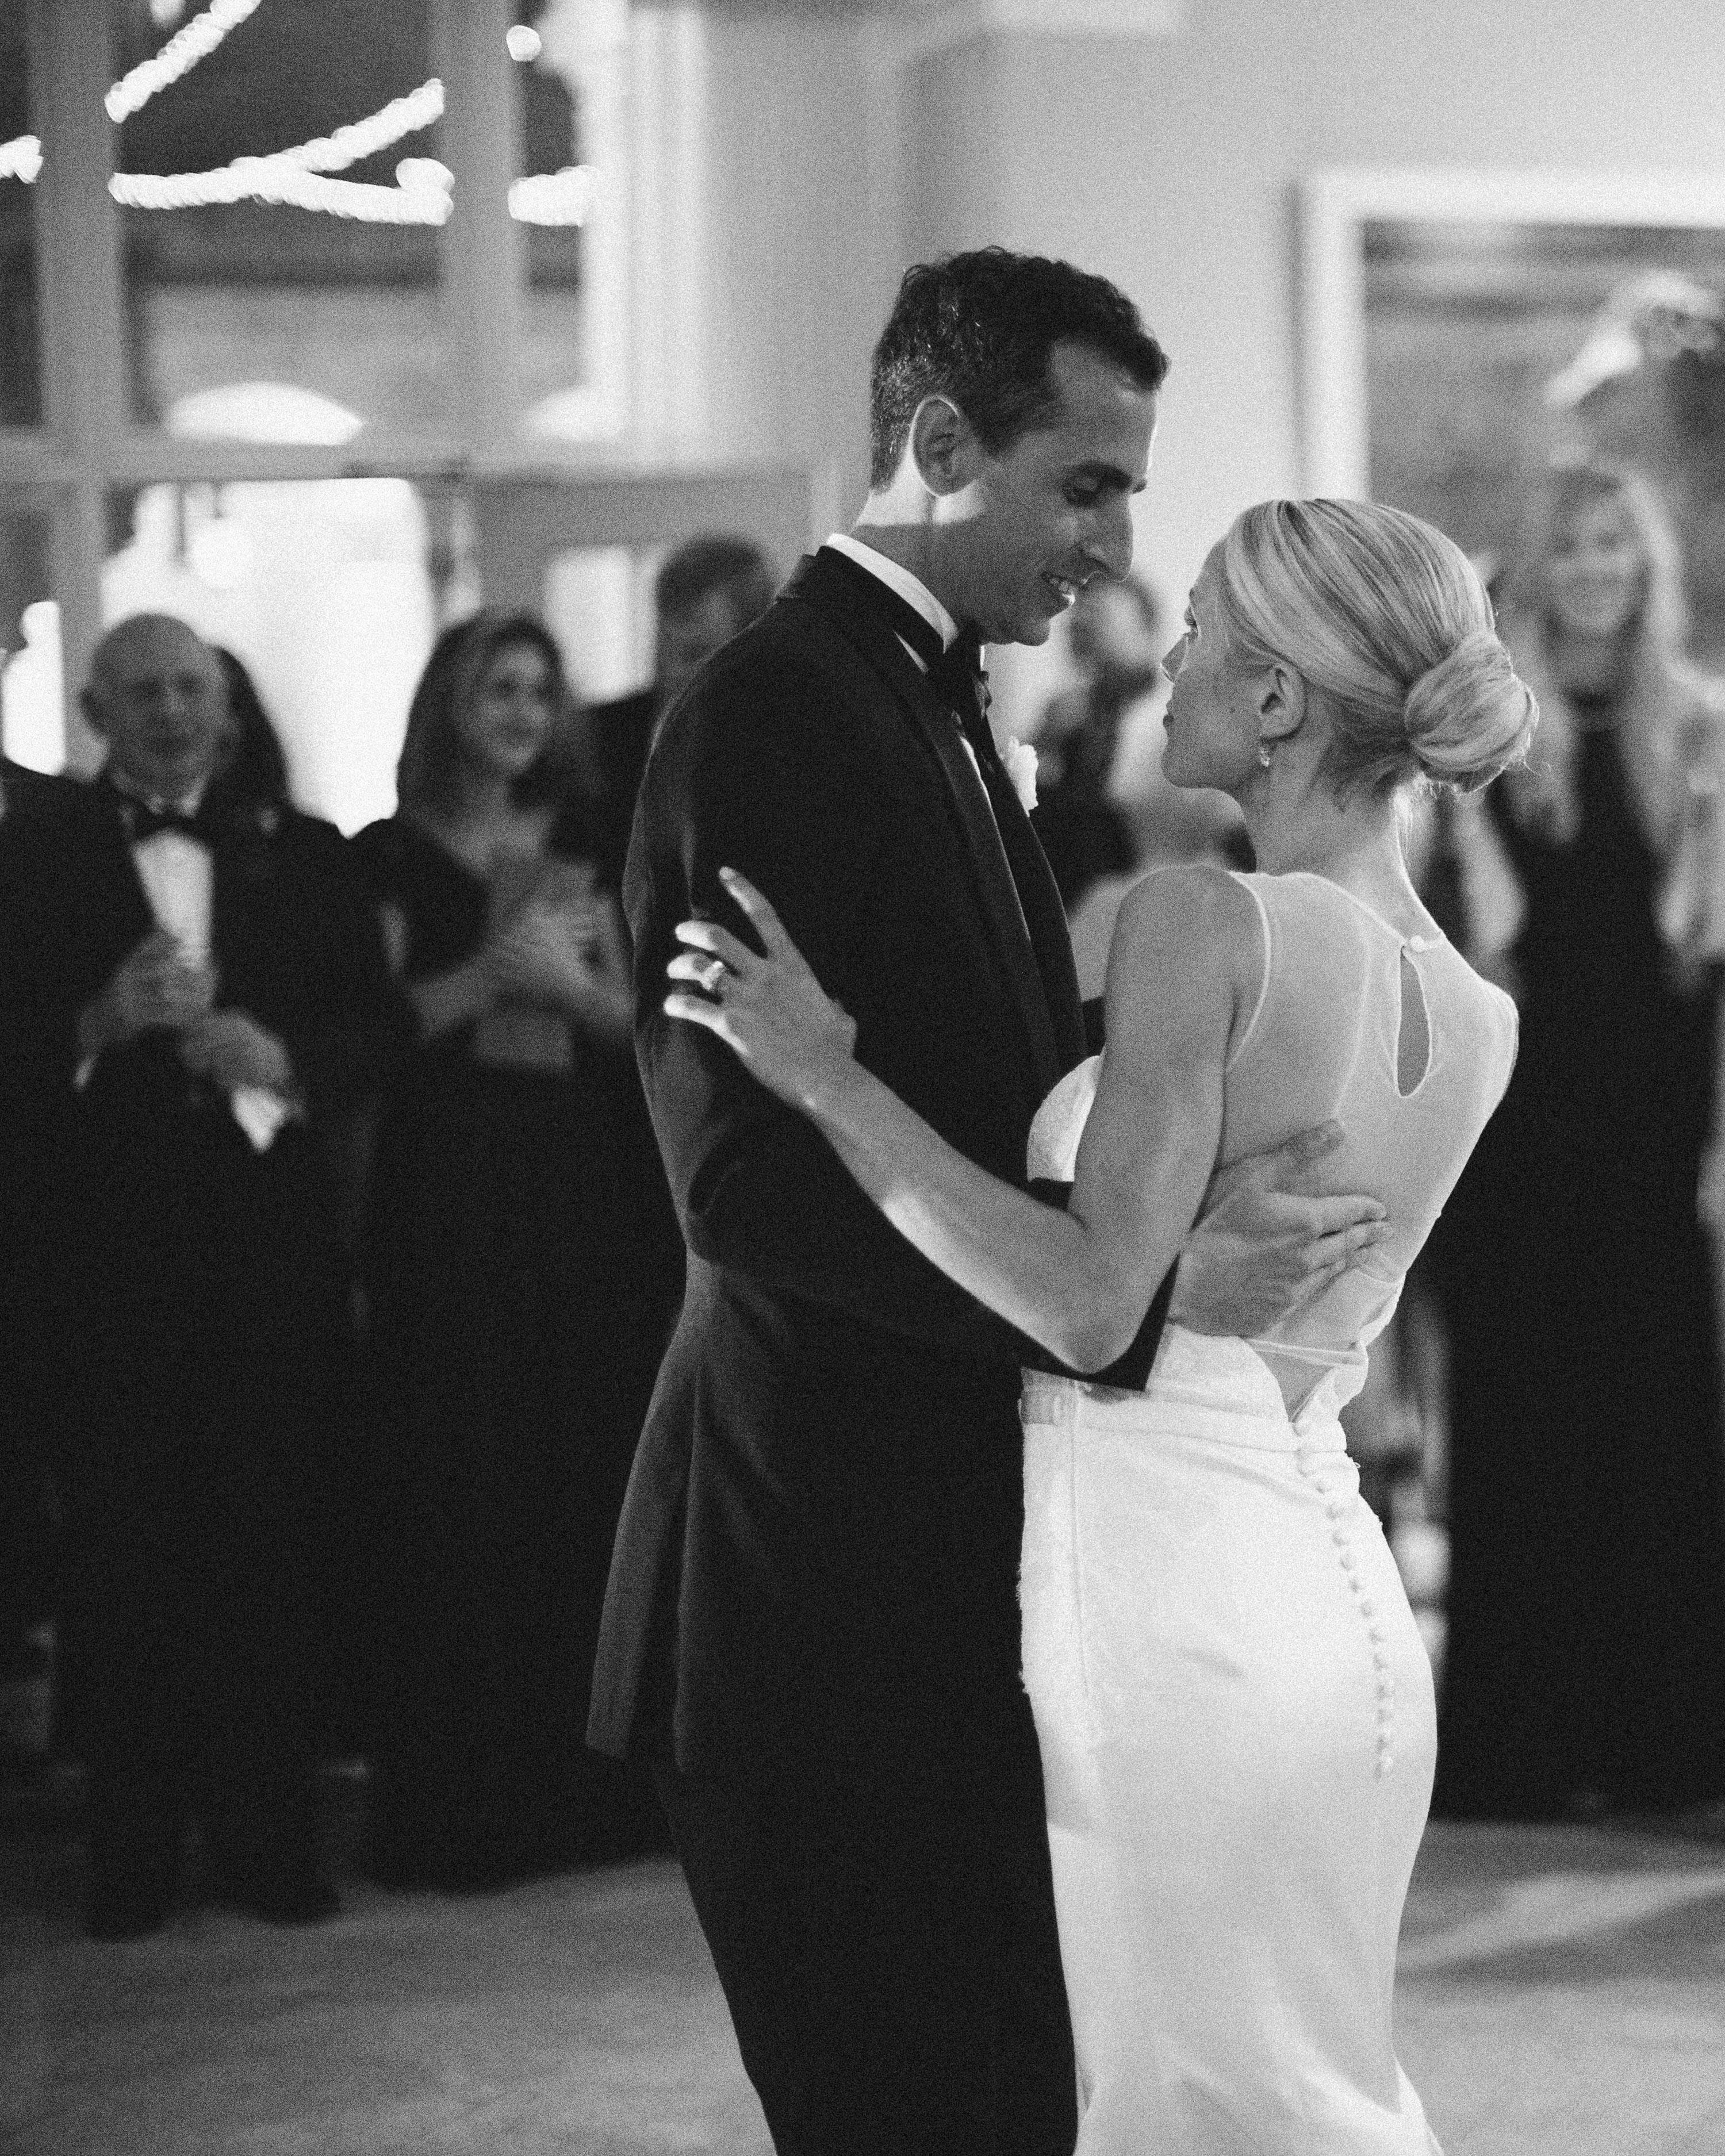 katie-kent-wedding-firstdance-749-s112765-0316.jpg